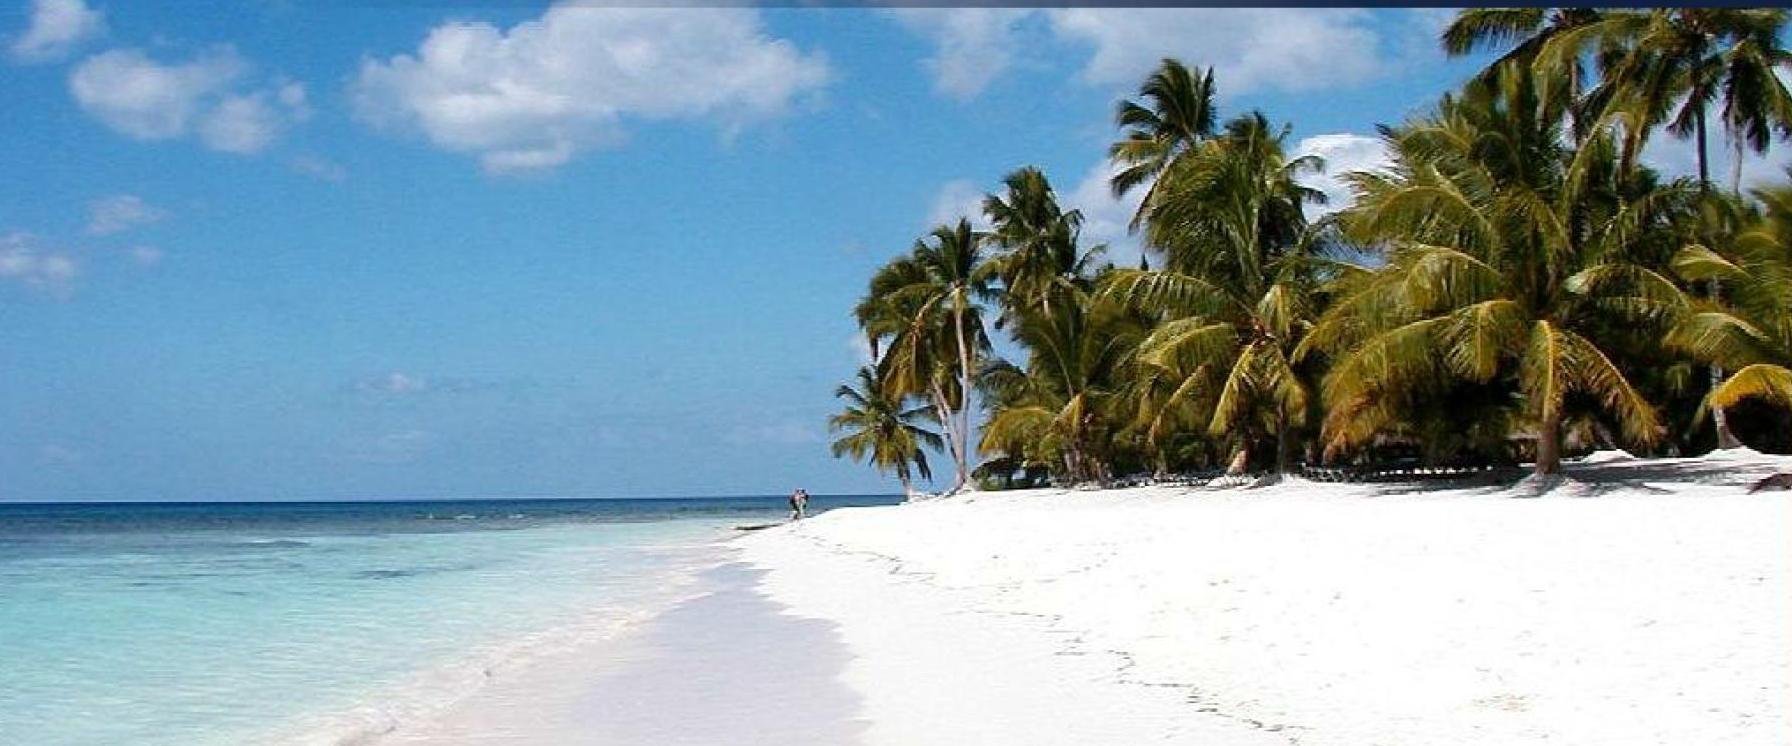 http://www.viaggiamo.it/wp-content/uploads/2015/07/spiaggia.jpg